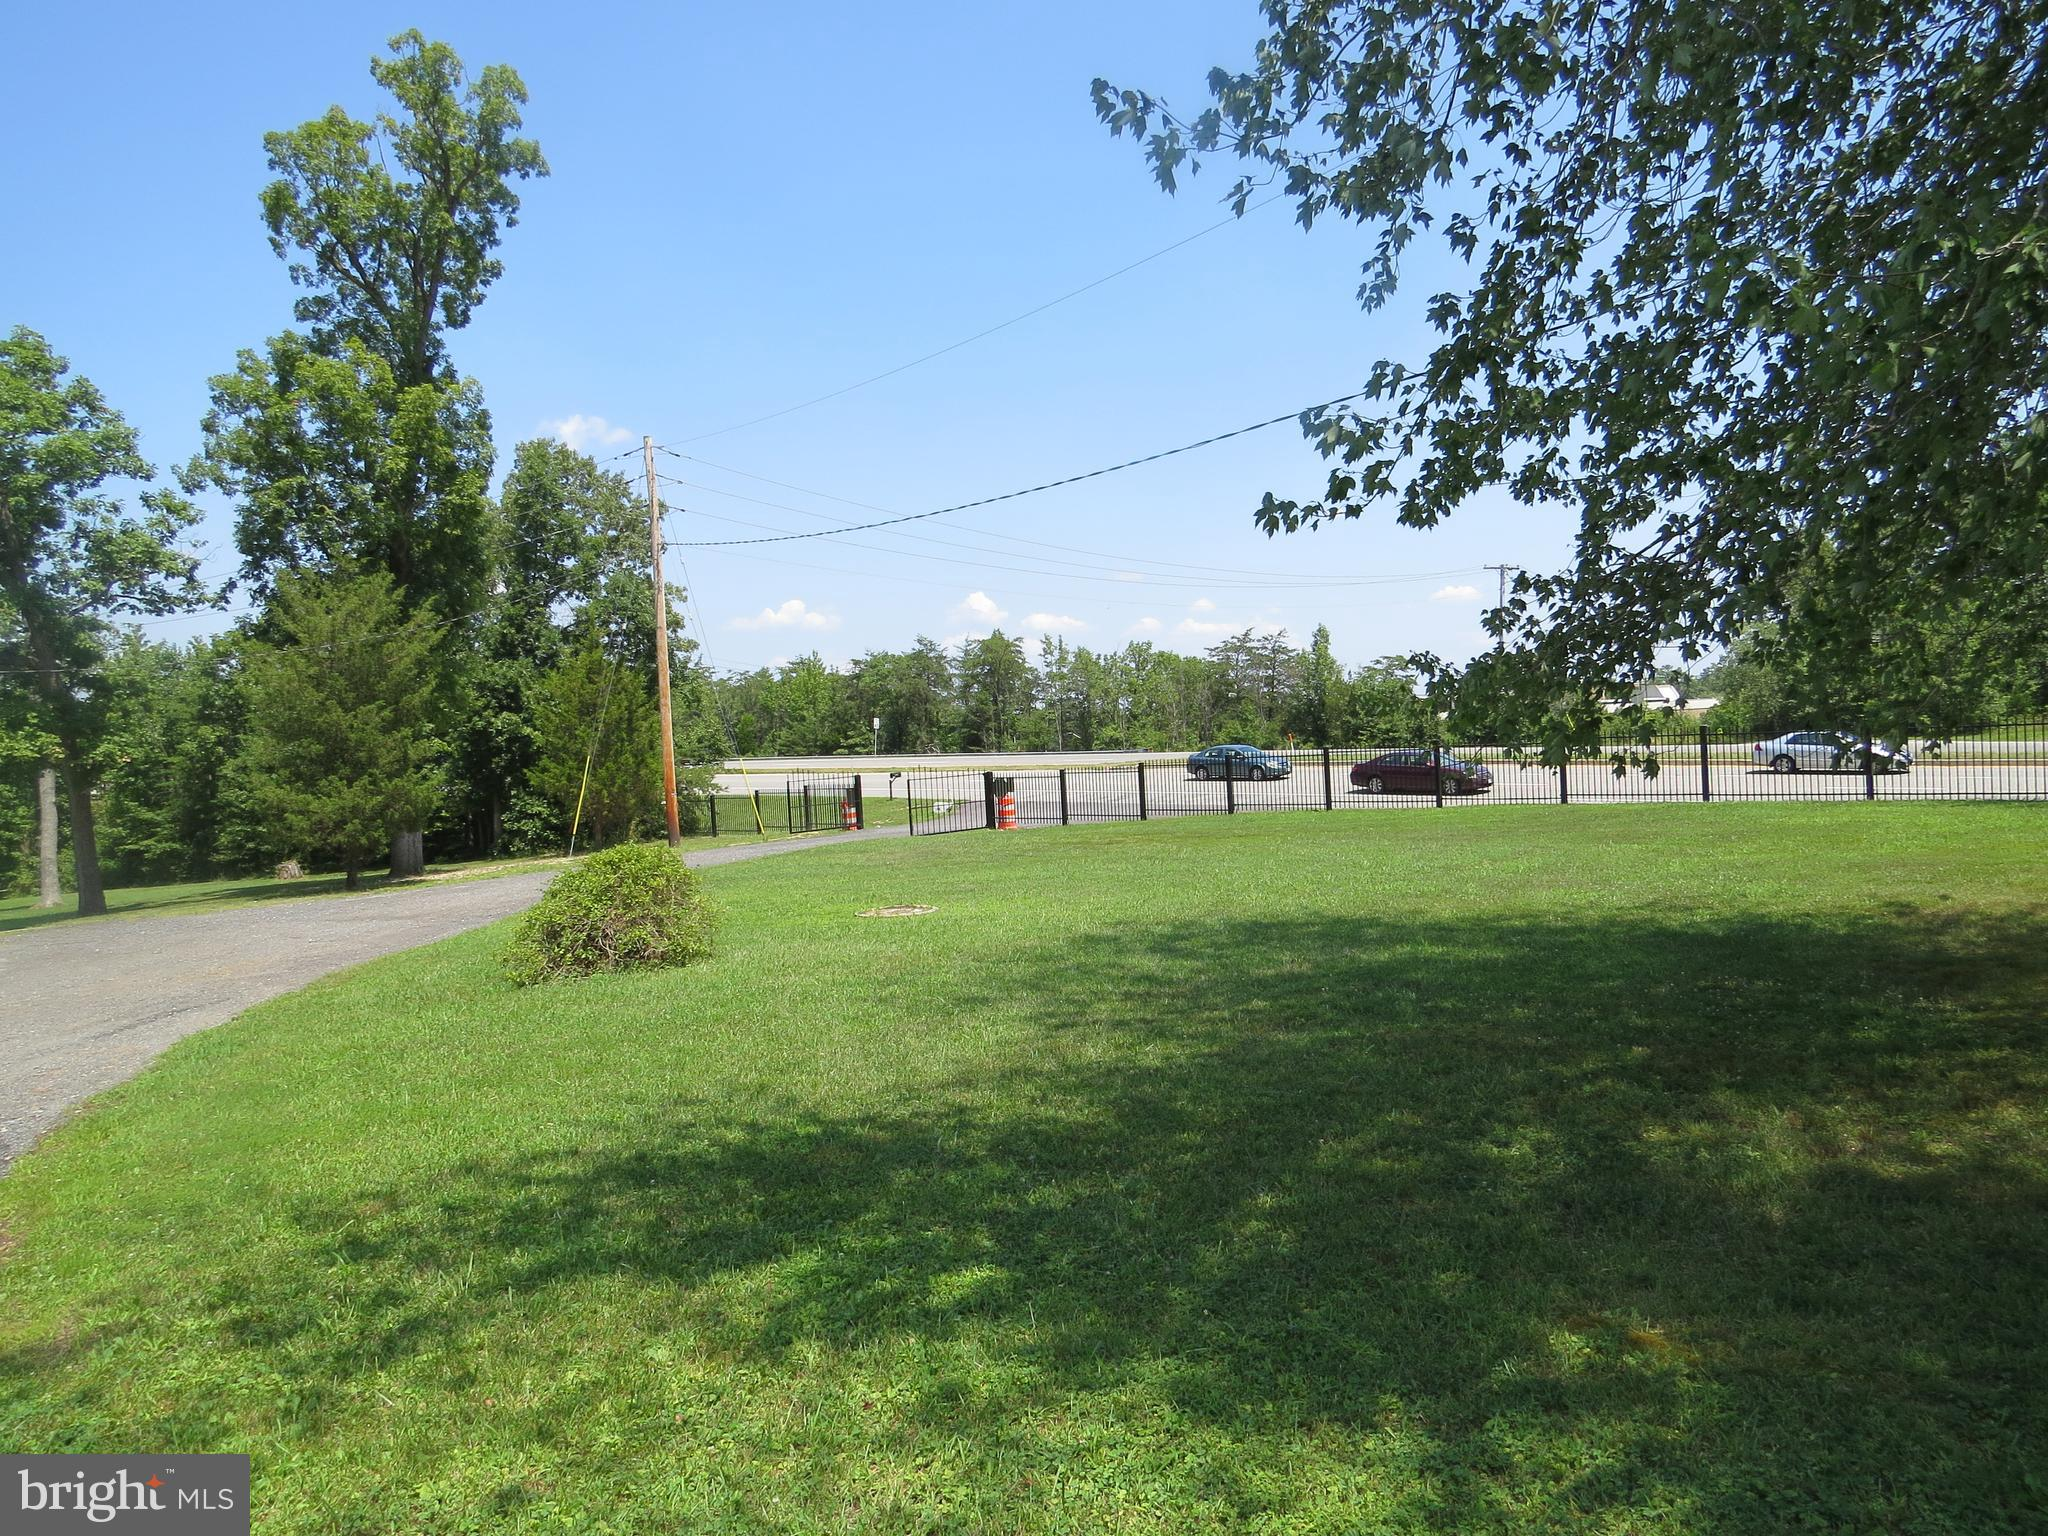 9109 NORMAL SCHOOL ROAD, BOWIE, MD 20715